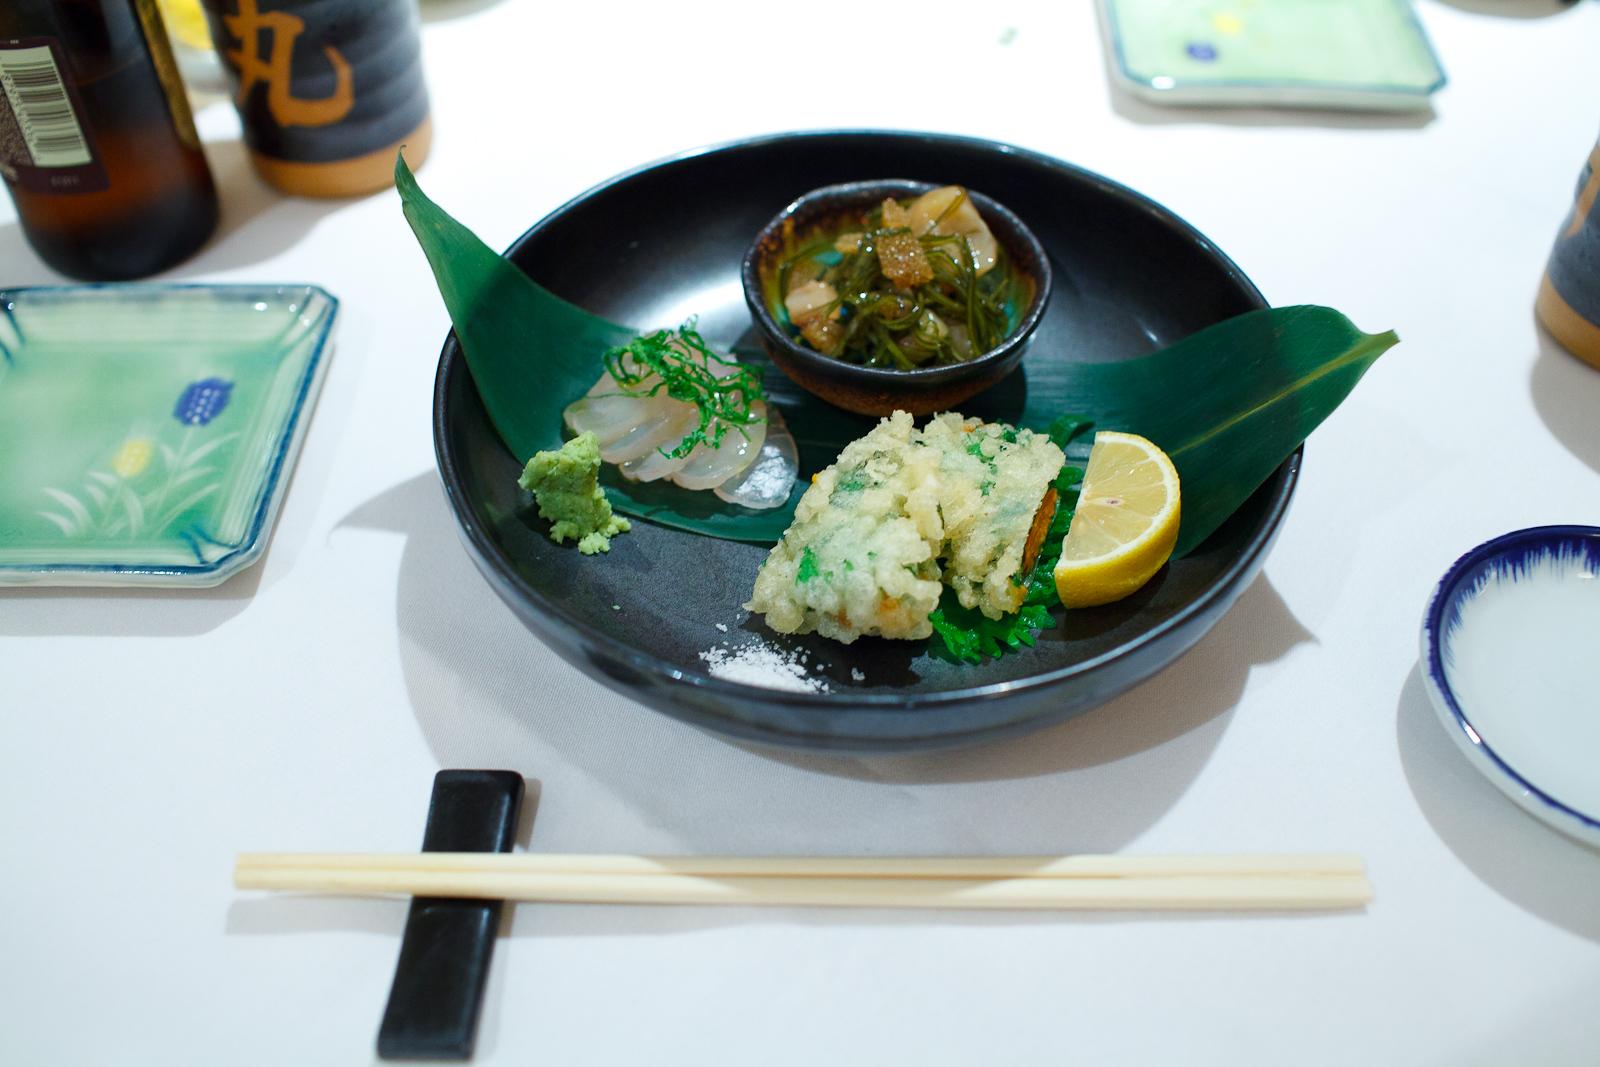 Kelp cured medai, squid, herring roe, seaweed marinated with soy sauce, sea urchin wrapped in shiso tempura ($12)